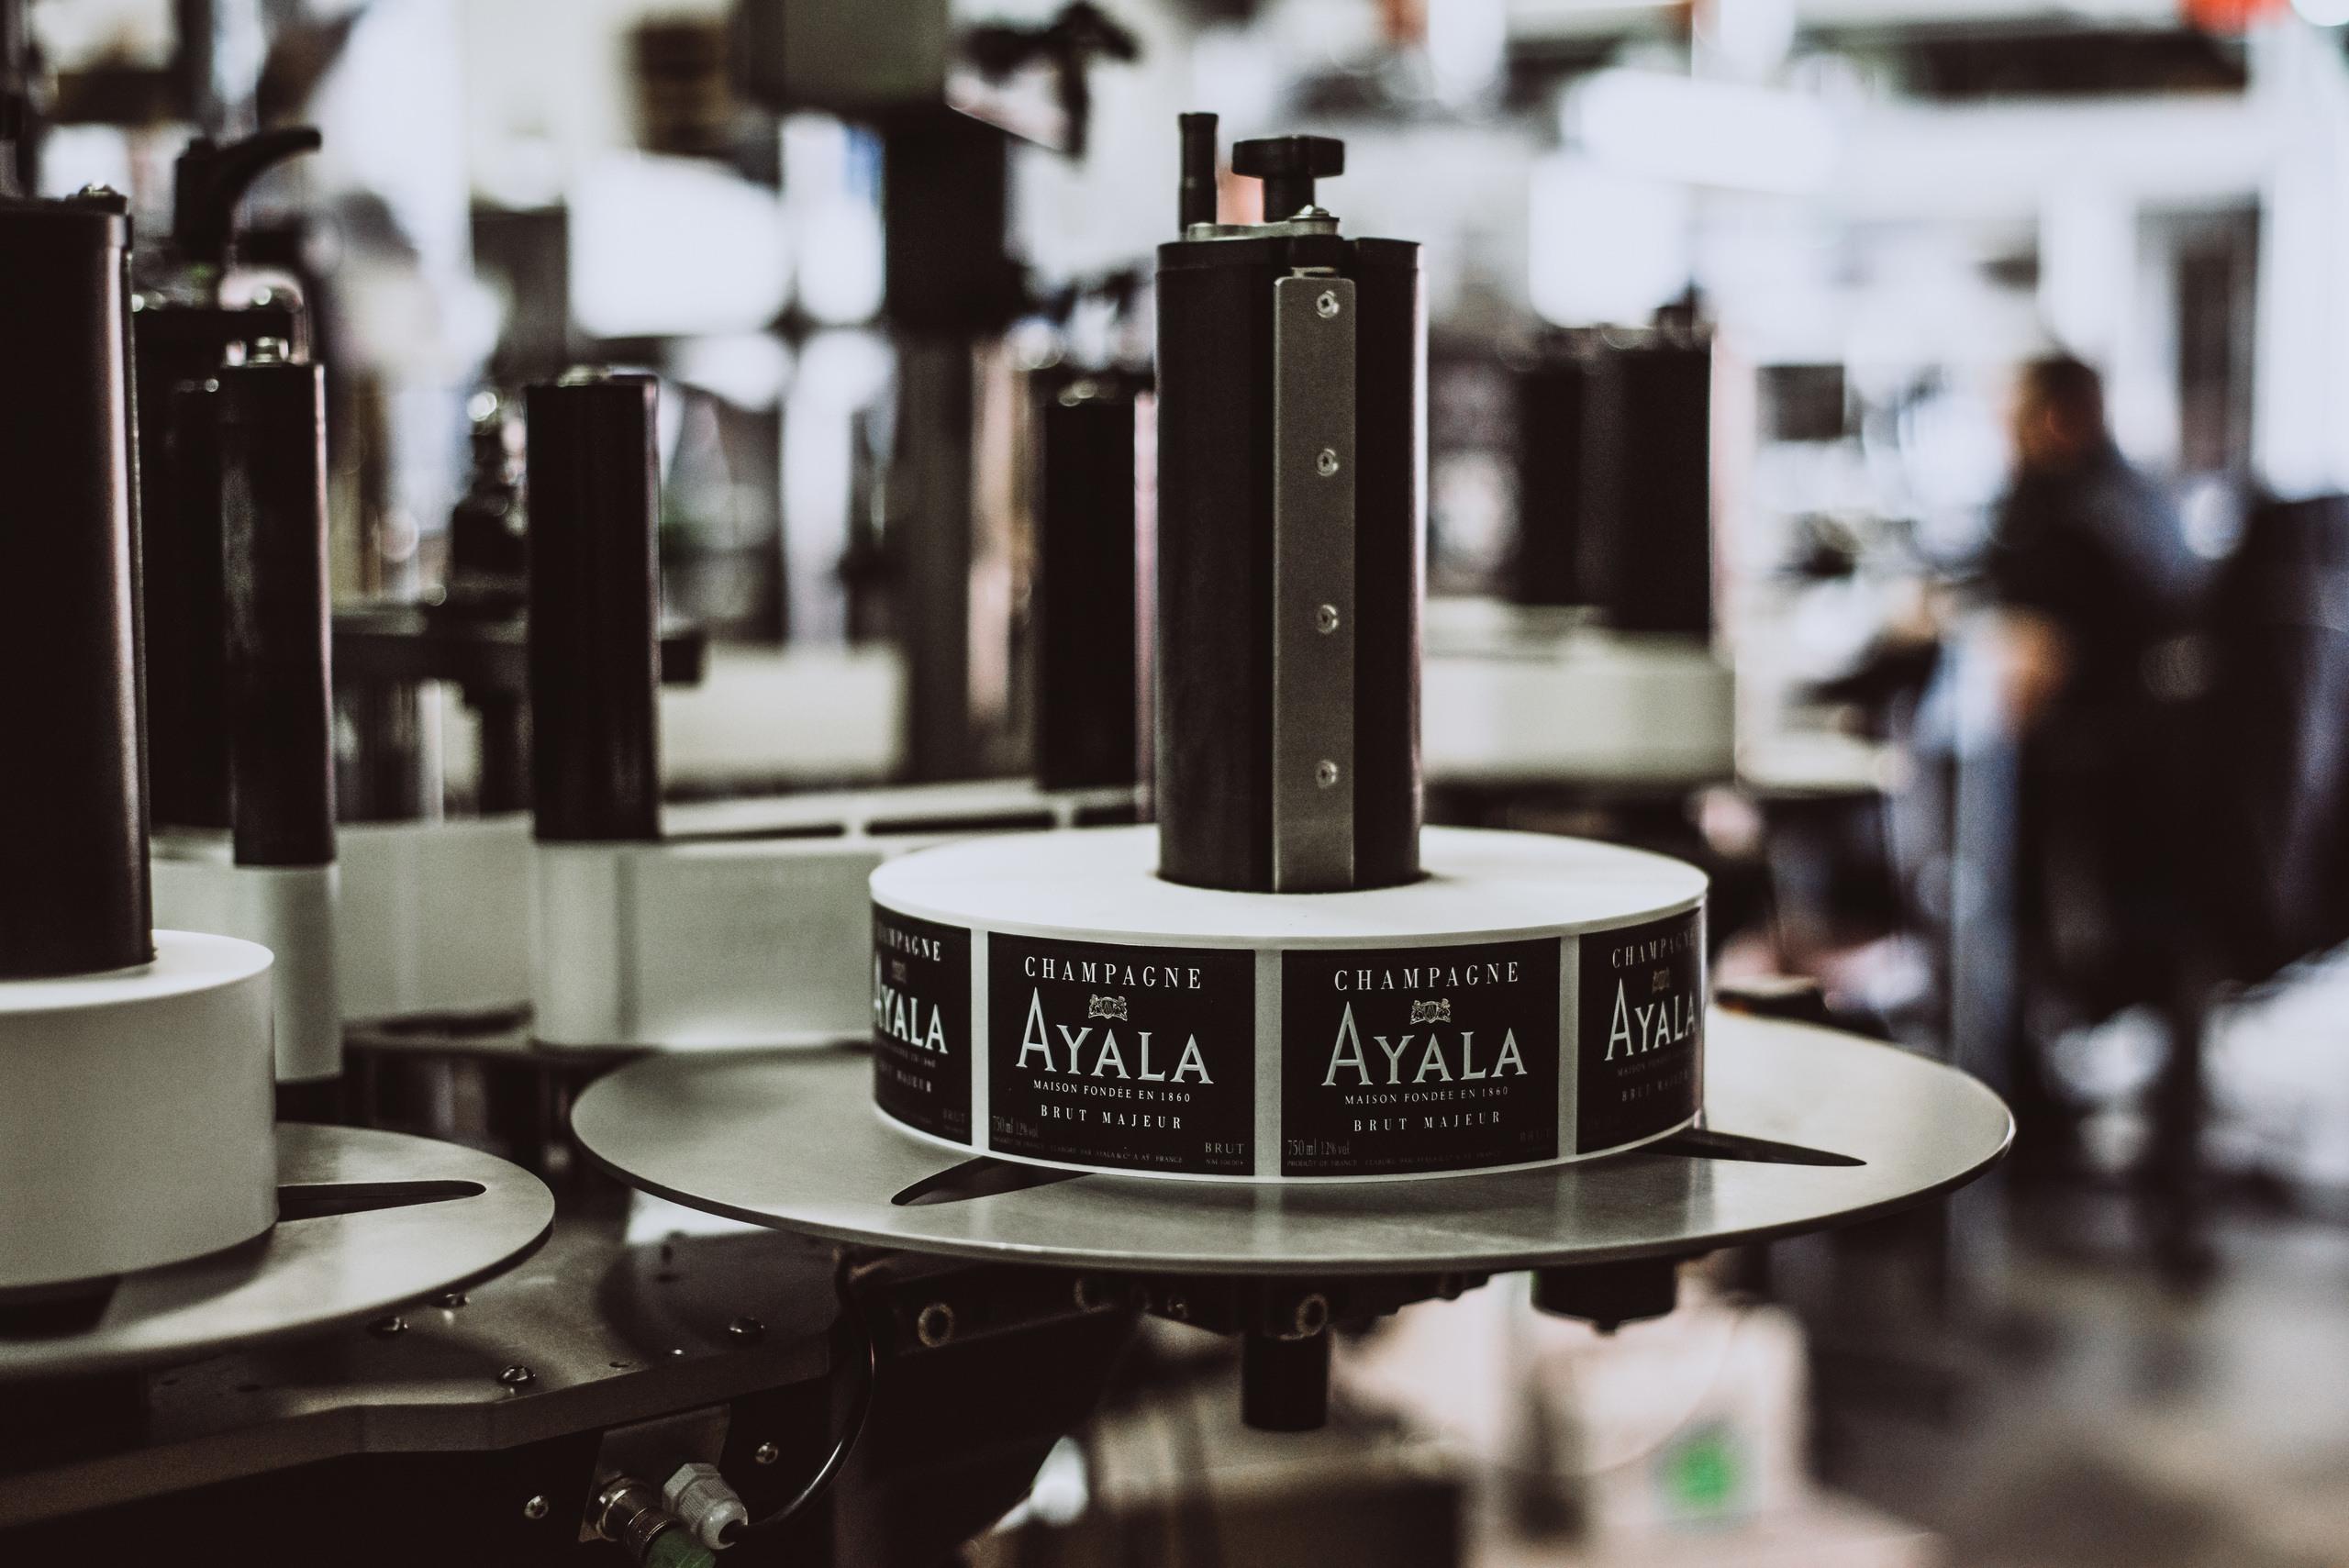 Menciones legales - Champagne Ayala